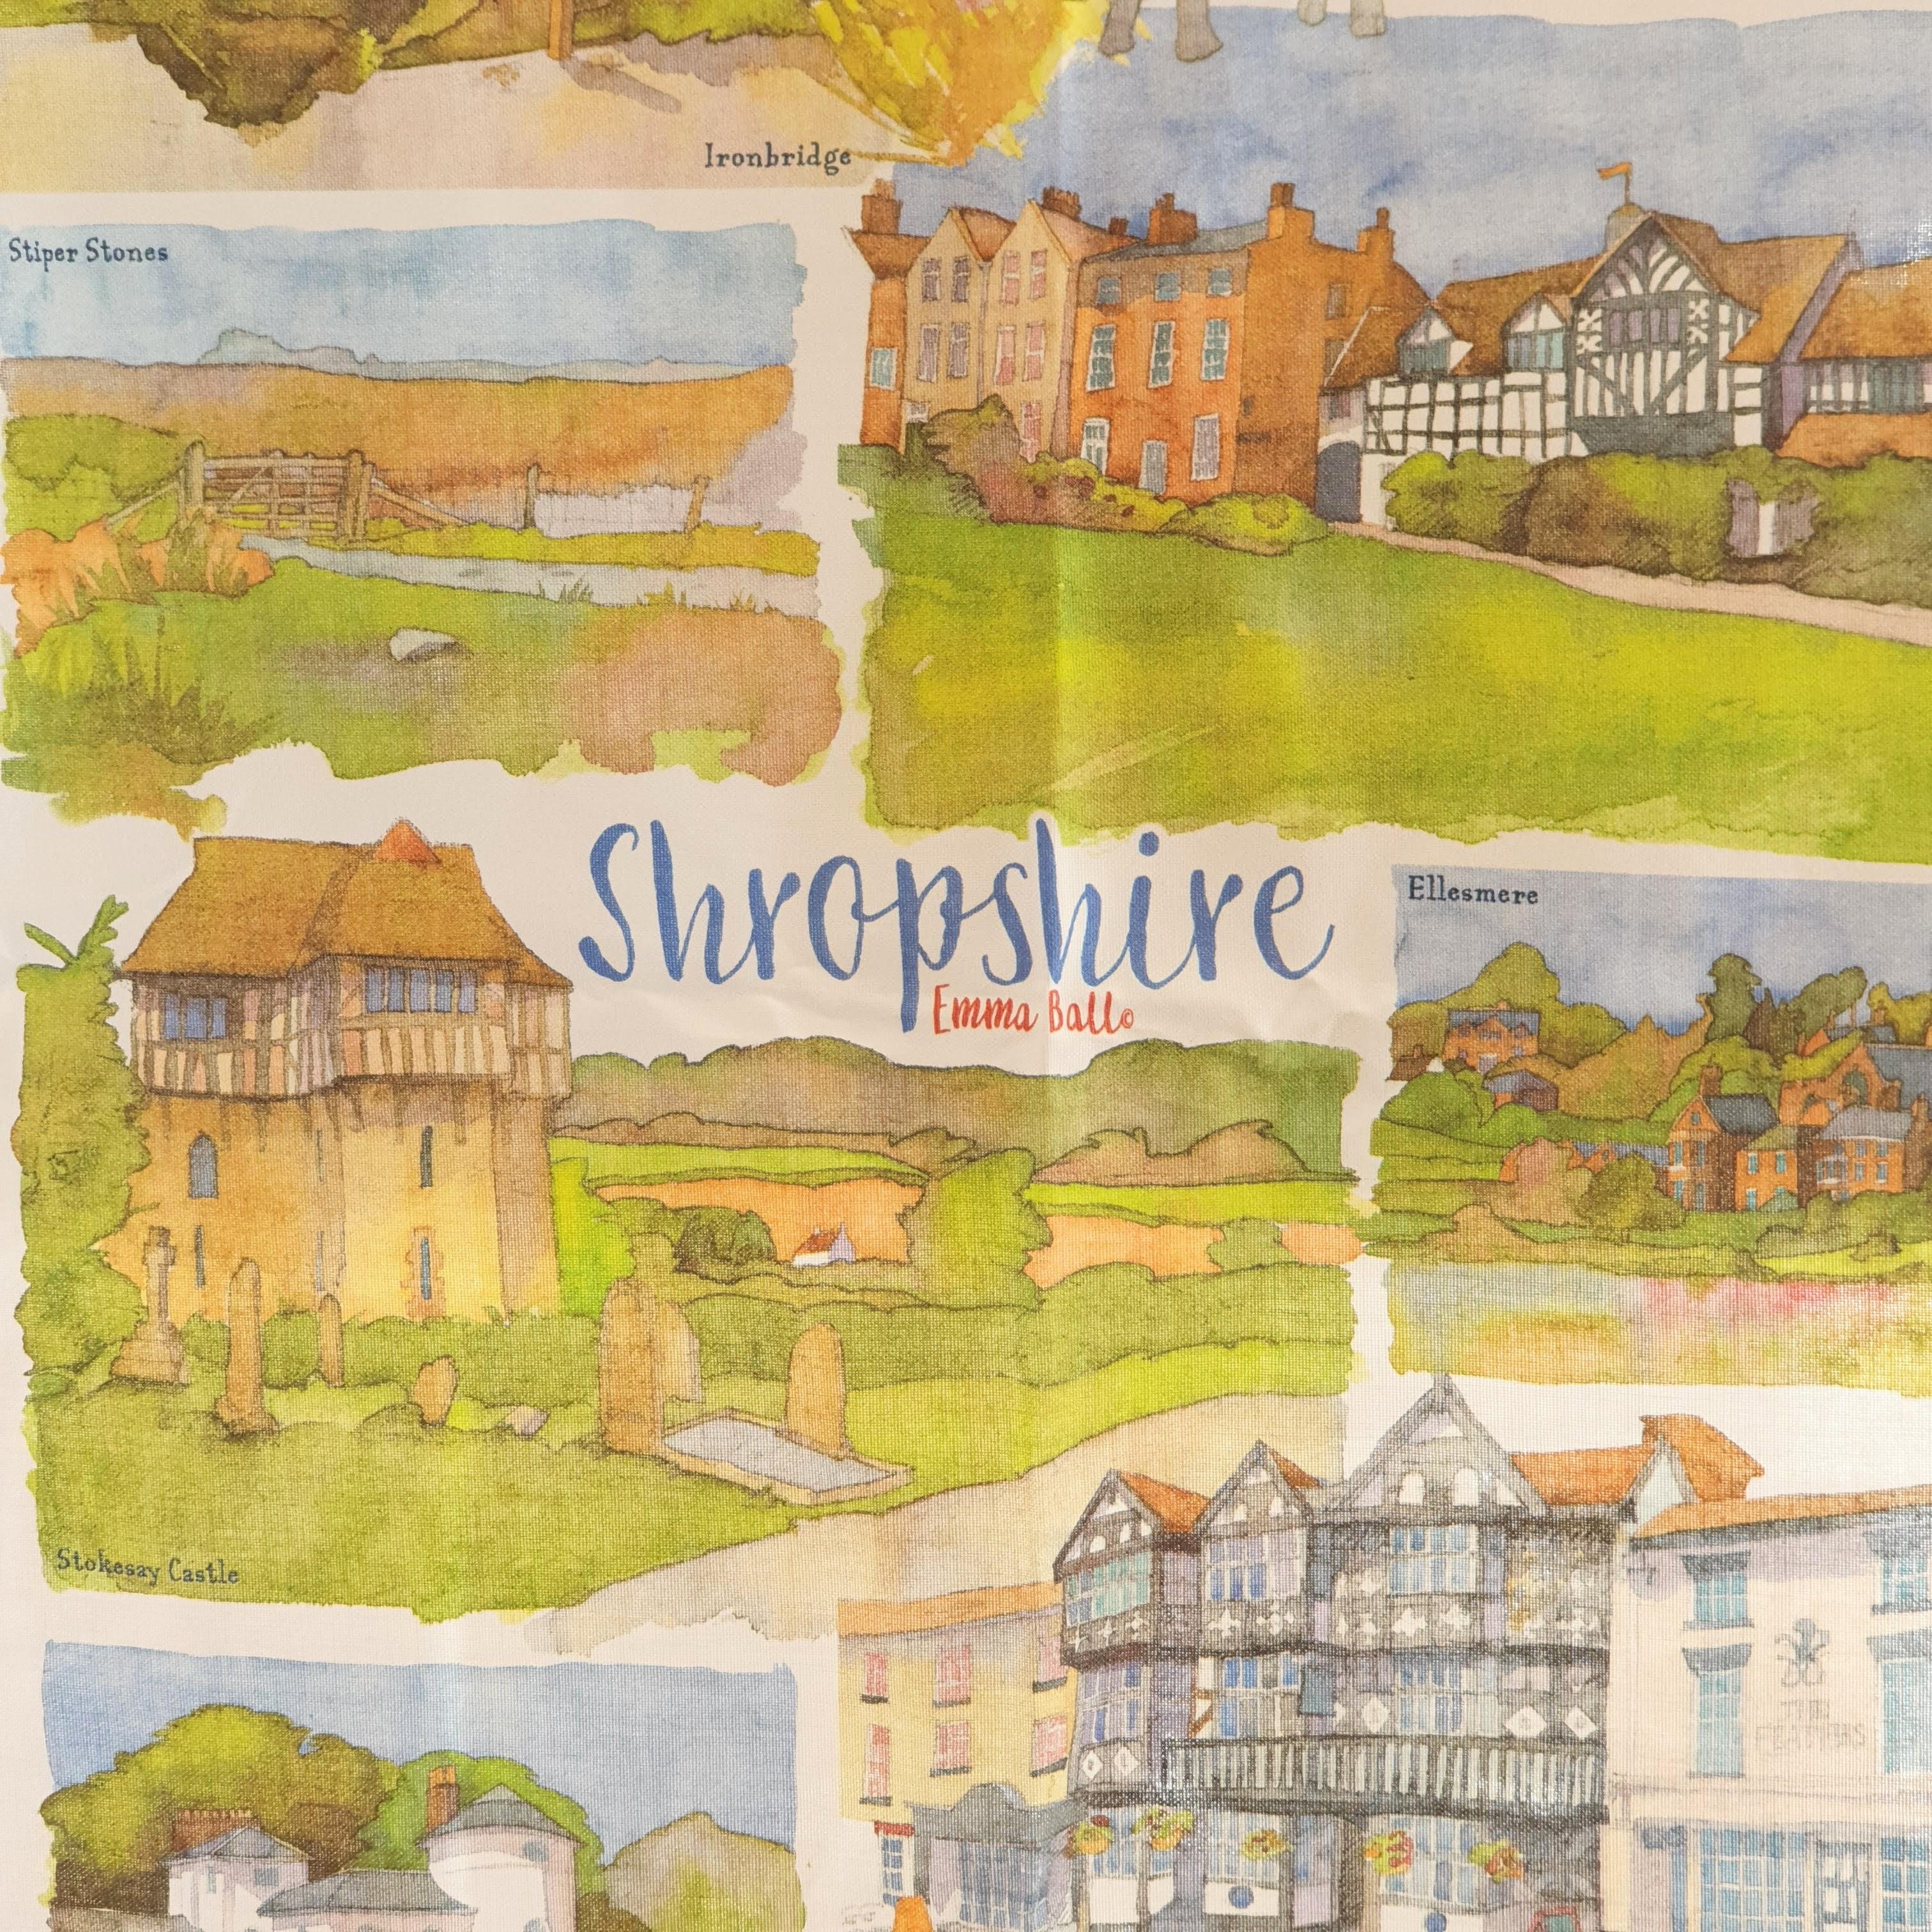 Shropshire teal towel close up